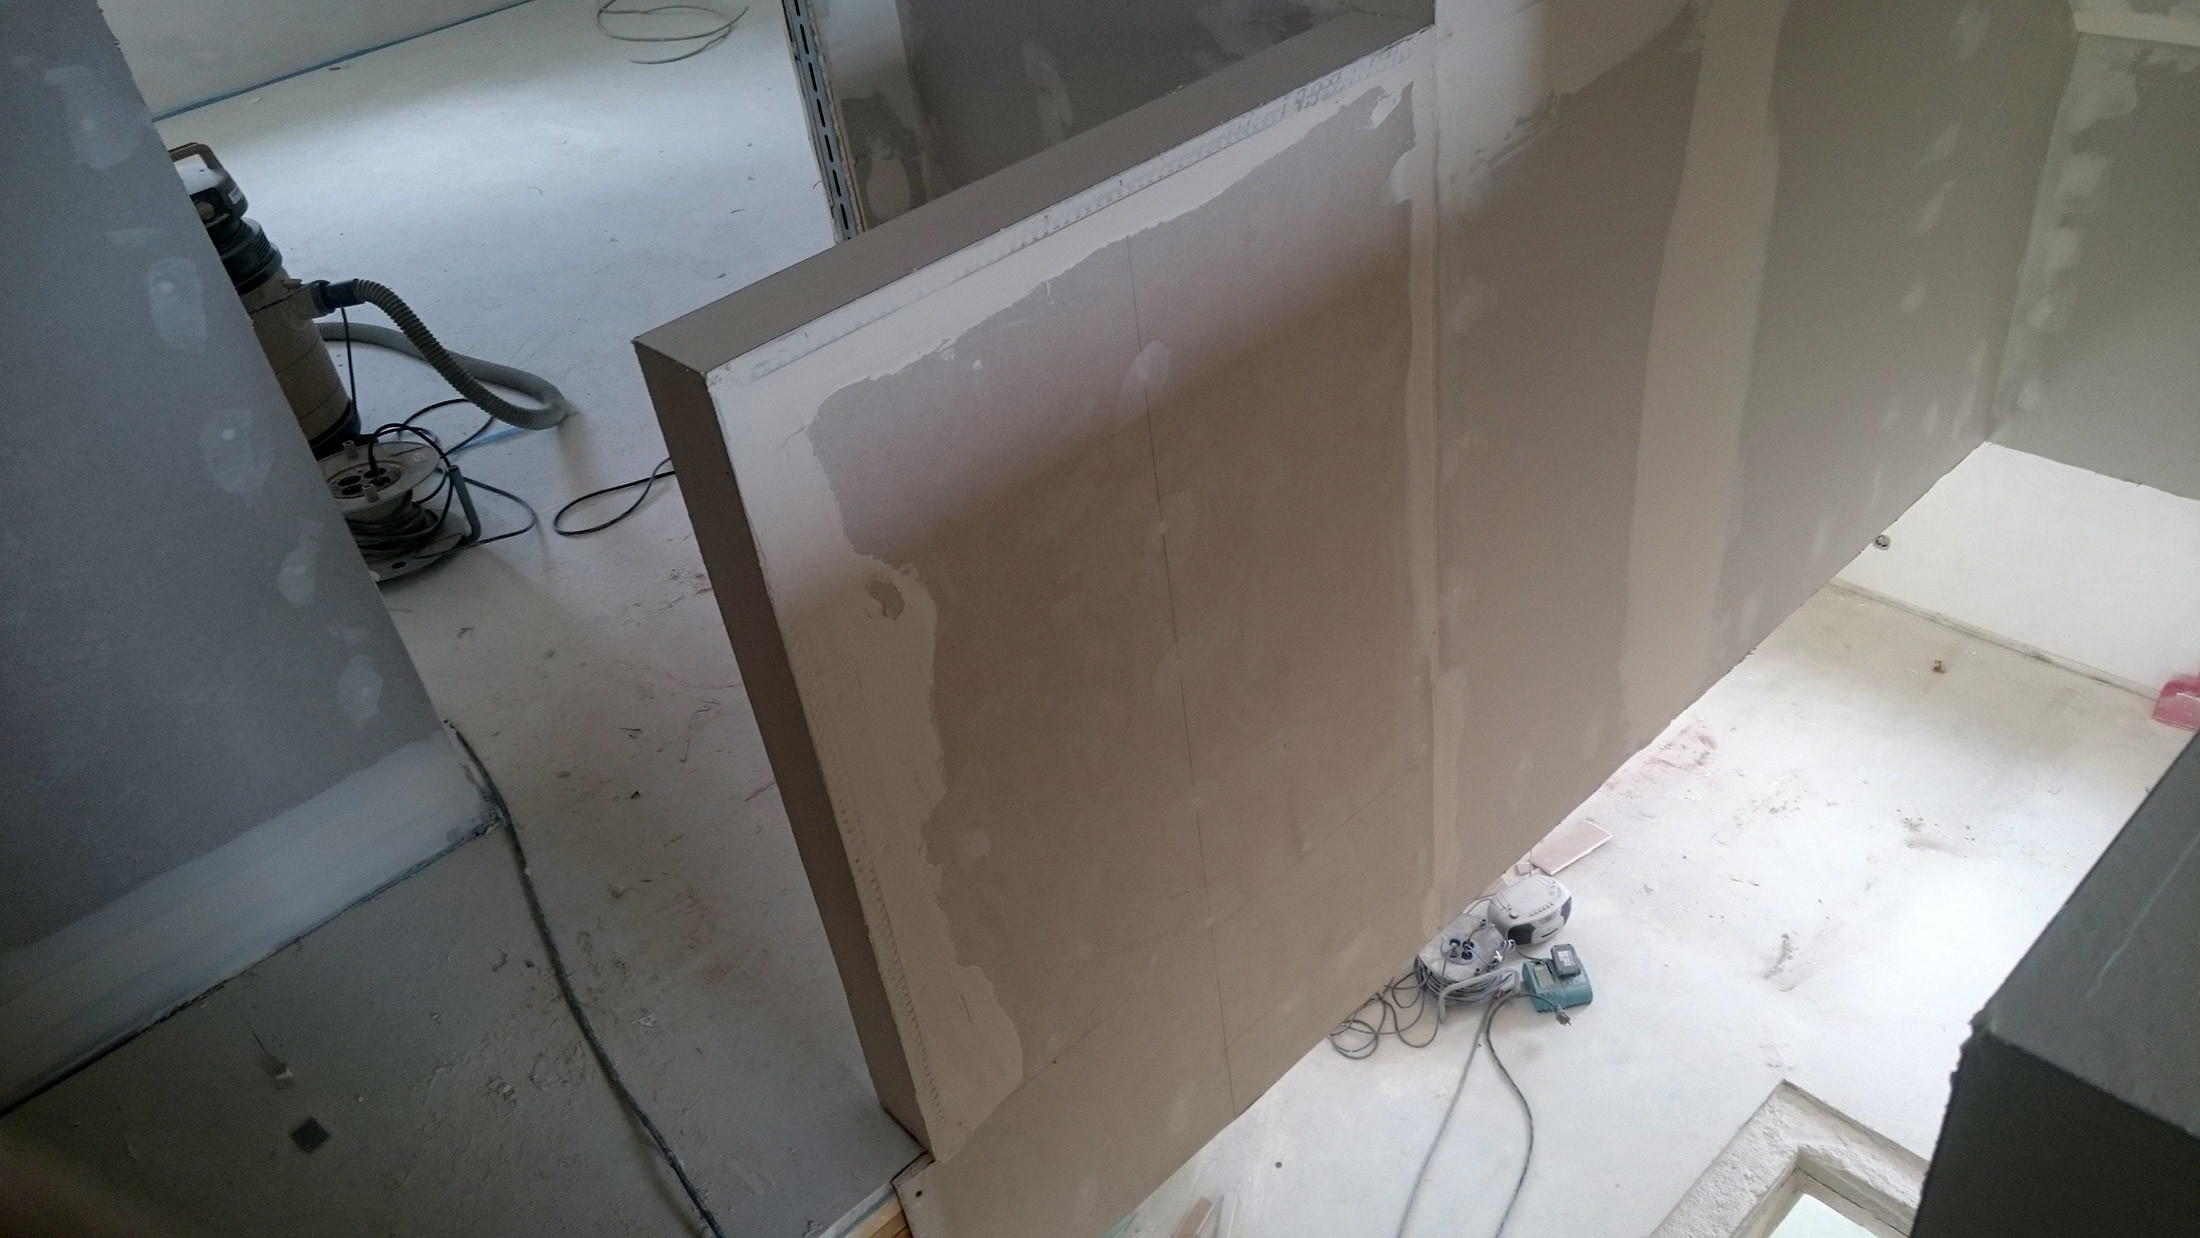 rigipswand bauen. cheap rigipswand bauen with rigipswand bauen. free